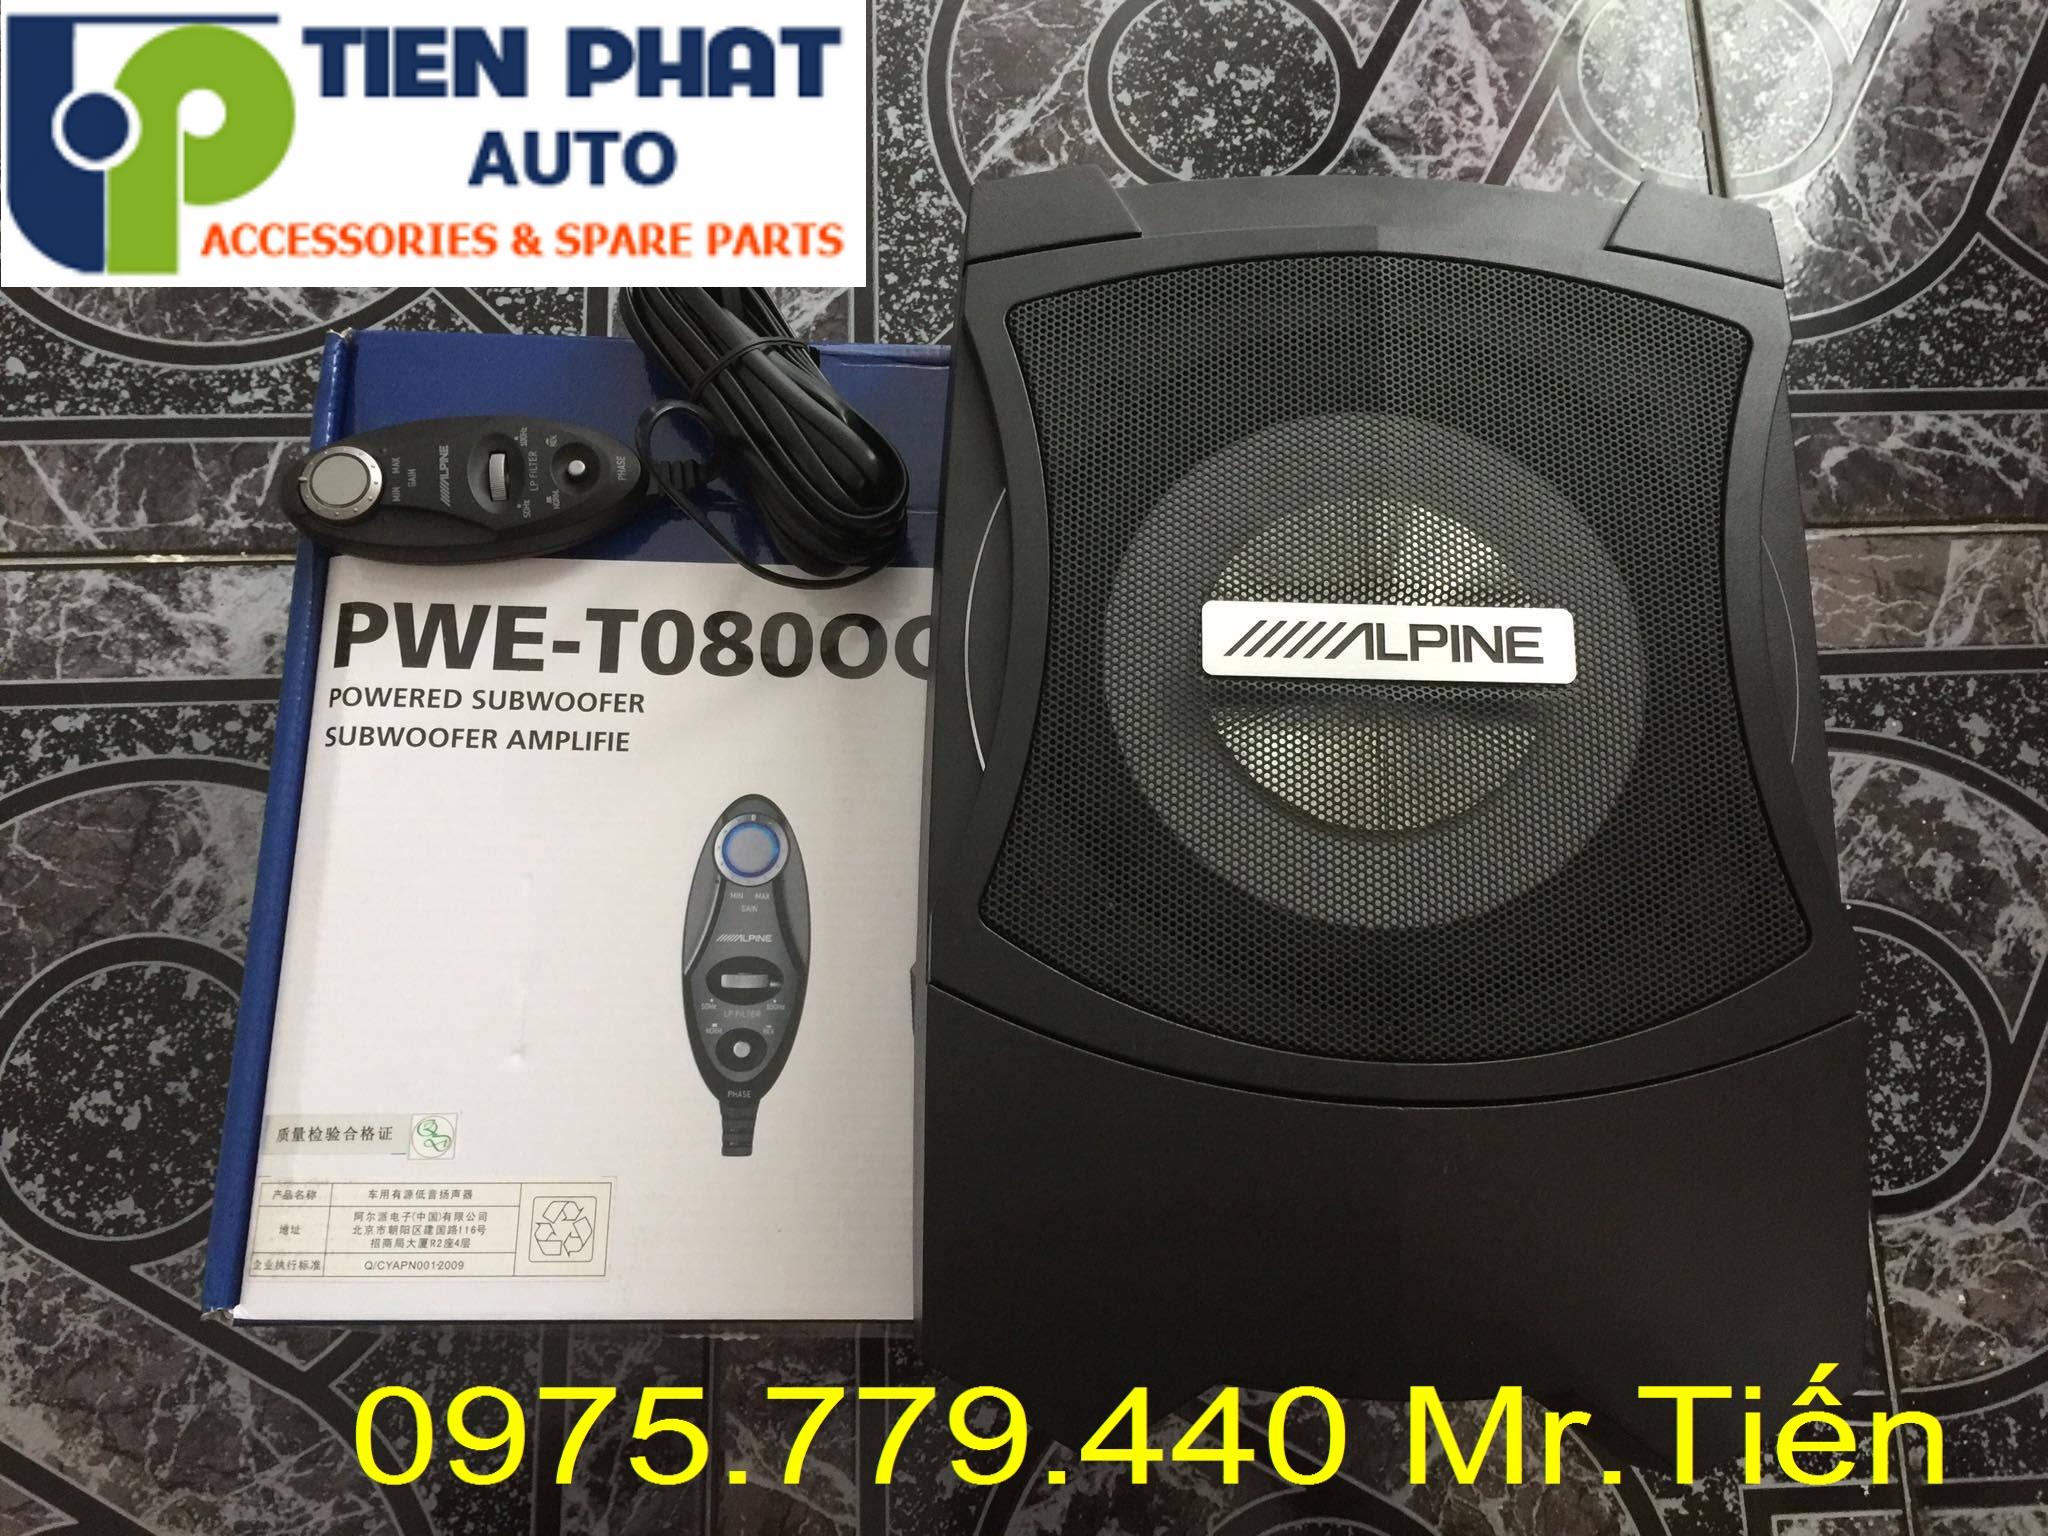 Lắp Loa sub Alpine PWE-T0800C cho Suzuki Vitara Lắp Đặt Tận Nơi